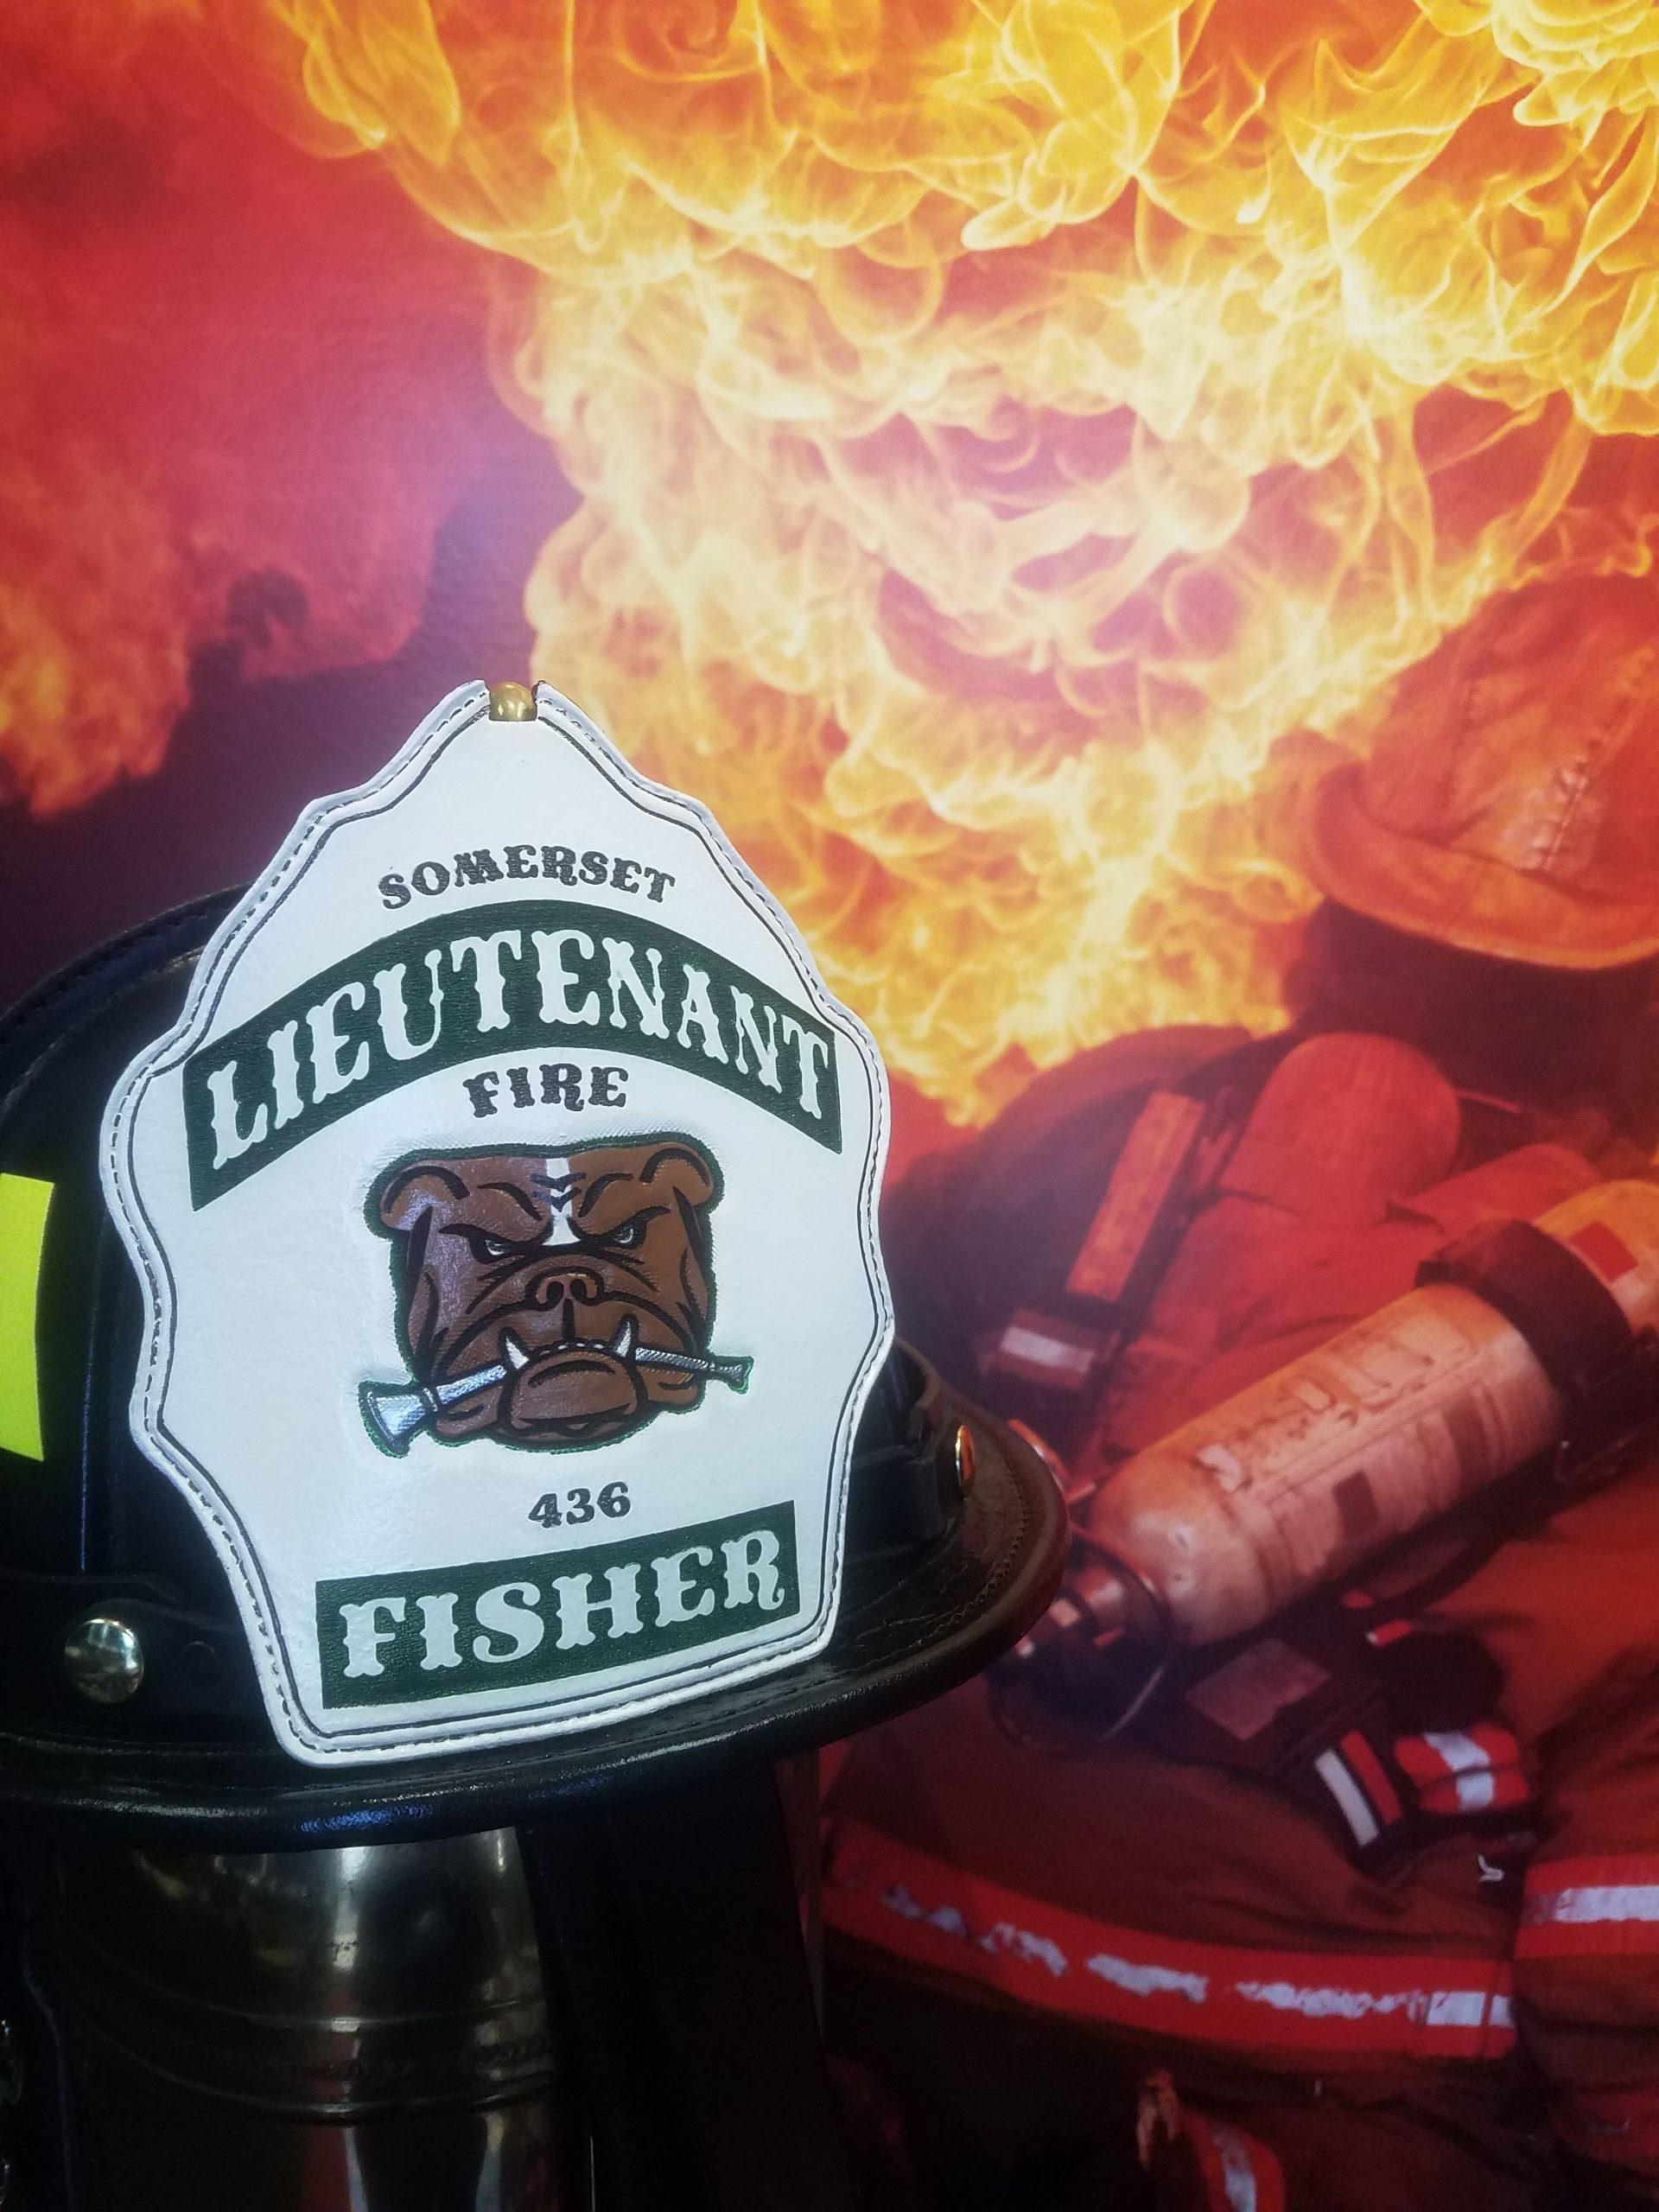 Firefighter Shields, Gillis Fronts, Helmet Fronts